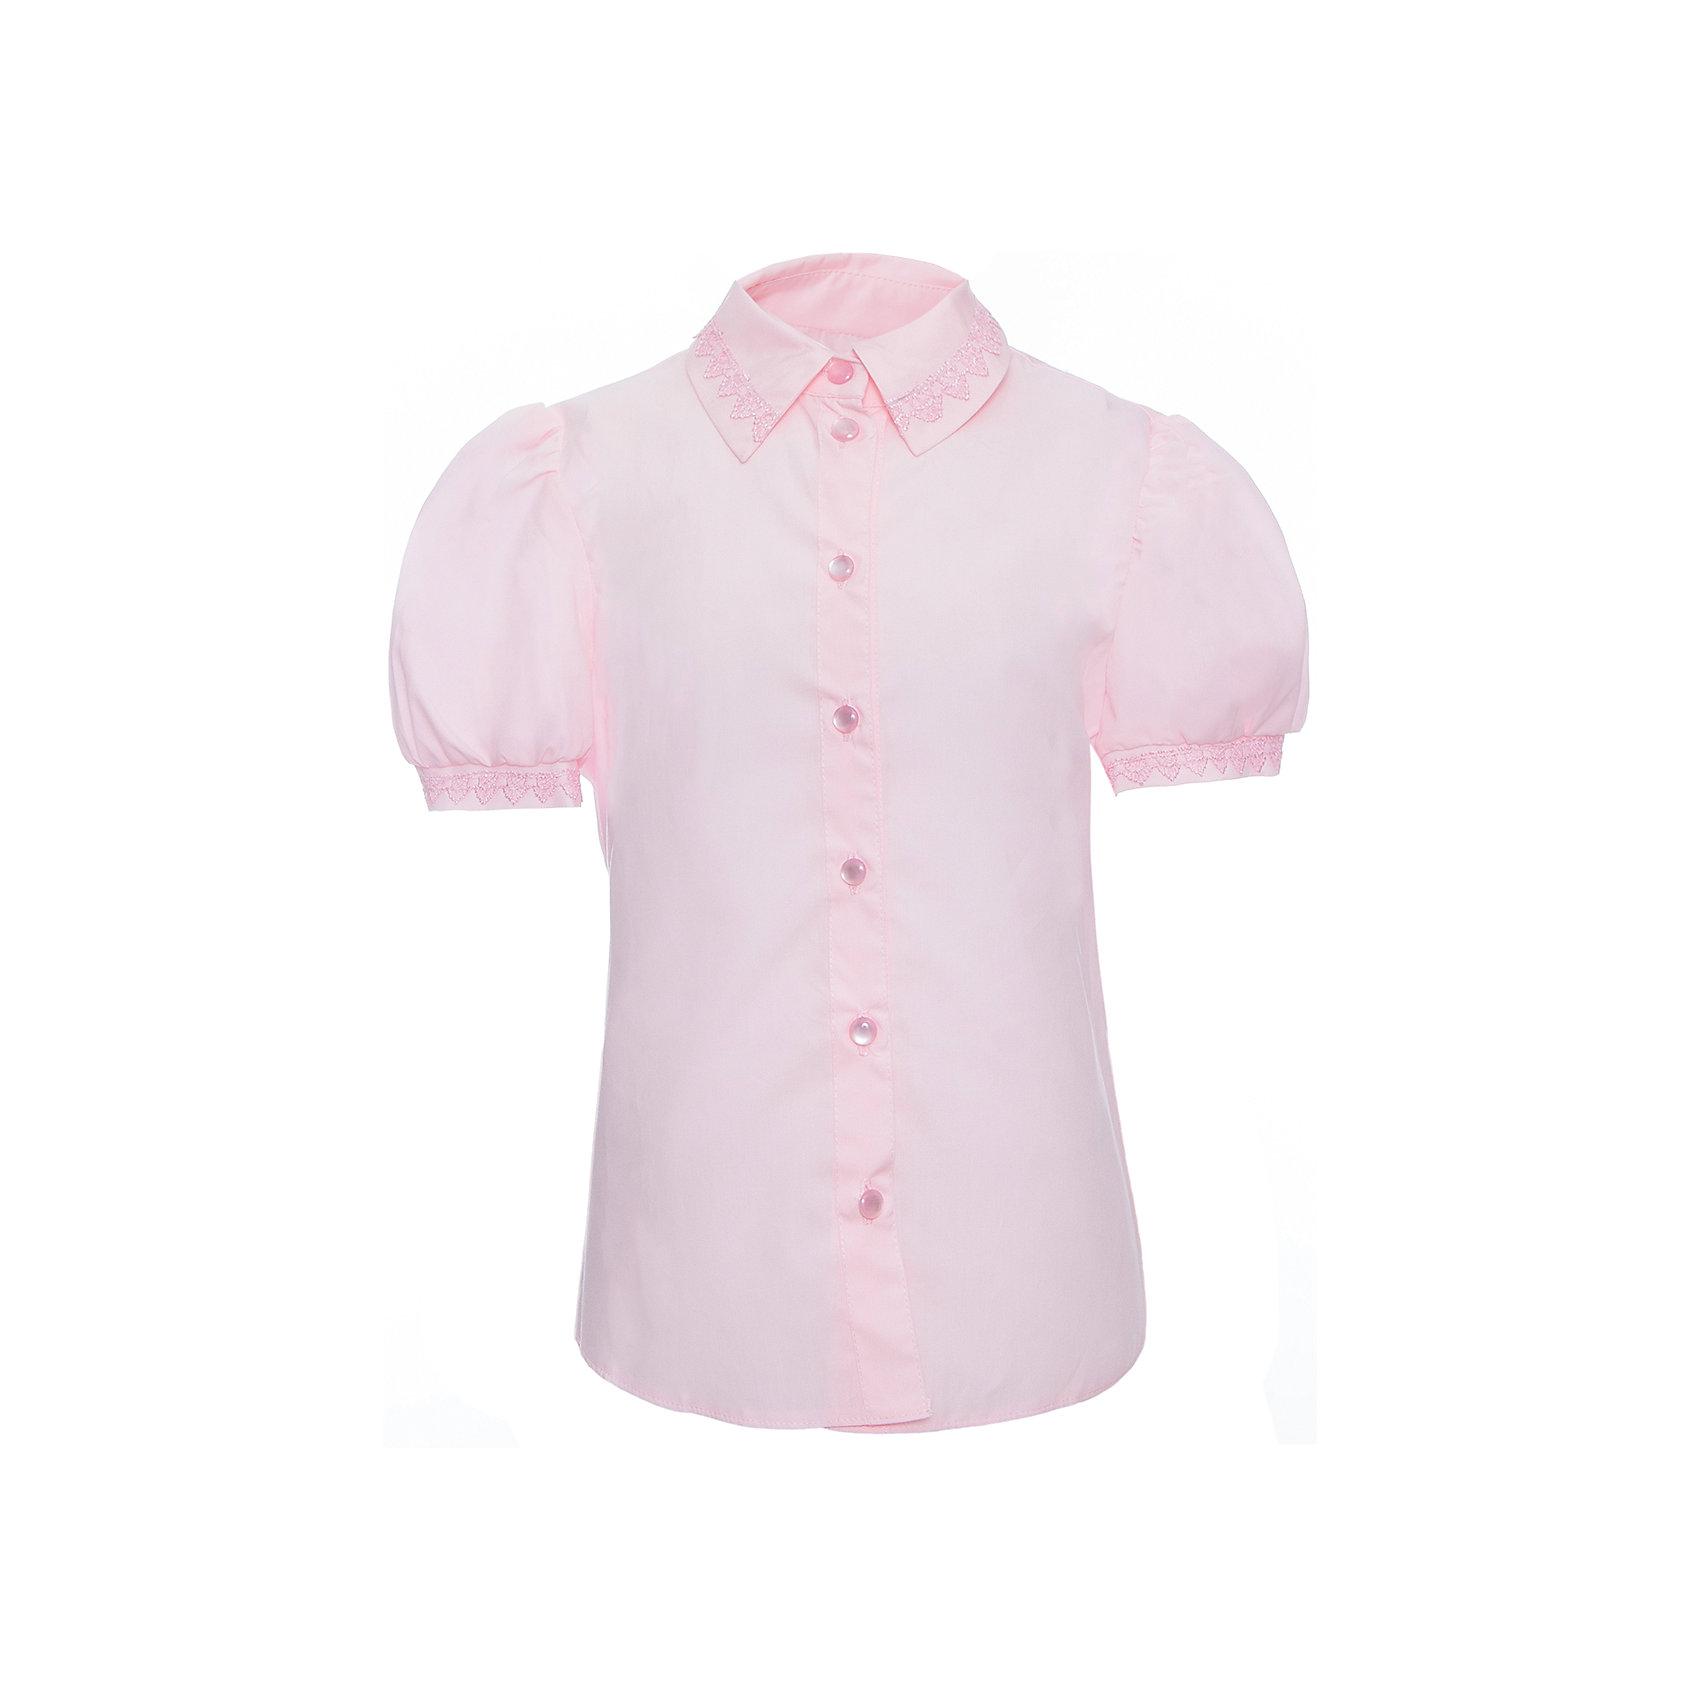 Блузка для девочки СменаБлузки и рубашки<br>Блузка для девочки от известного бренда Смена<br><br>Состав:<br>35%-хлопок;65%-полиэстер<br><br>Ширина мм: 186<br>Глубина мм: 87<br>Высота мм: 198<br>Вес г: 197<br>Цвет: розовый<br>Возраст от месяцев: 132<br>Возраст до месяцев: 144<br>Пол: Женский<br>Возраст: Детский<br>Размер: 152,134,158,140,146,128,122<br>SKU: 4720325